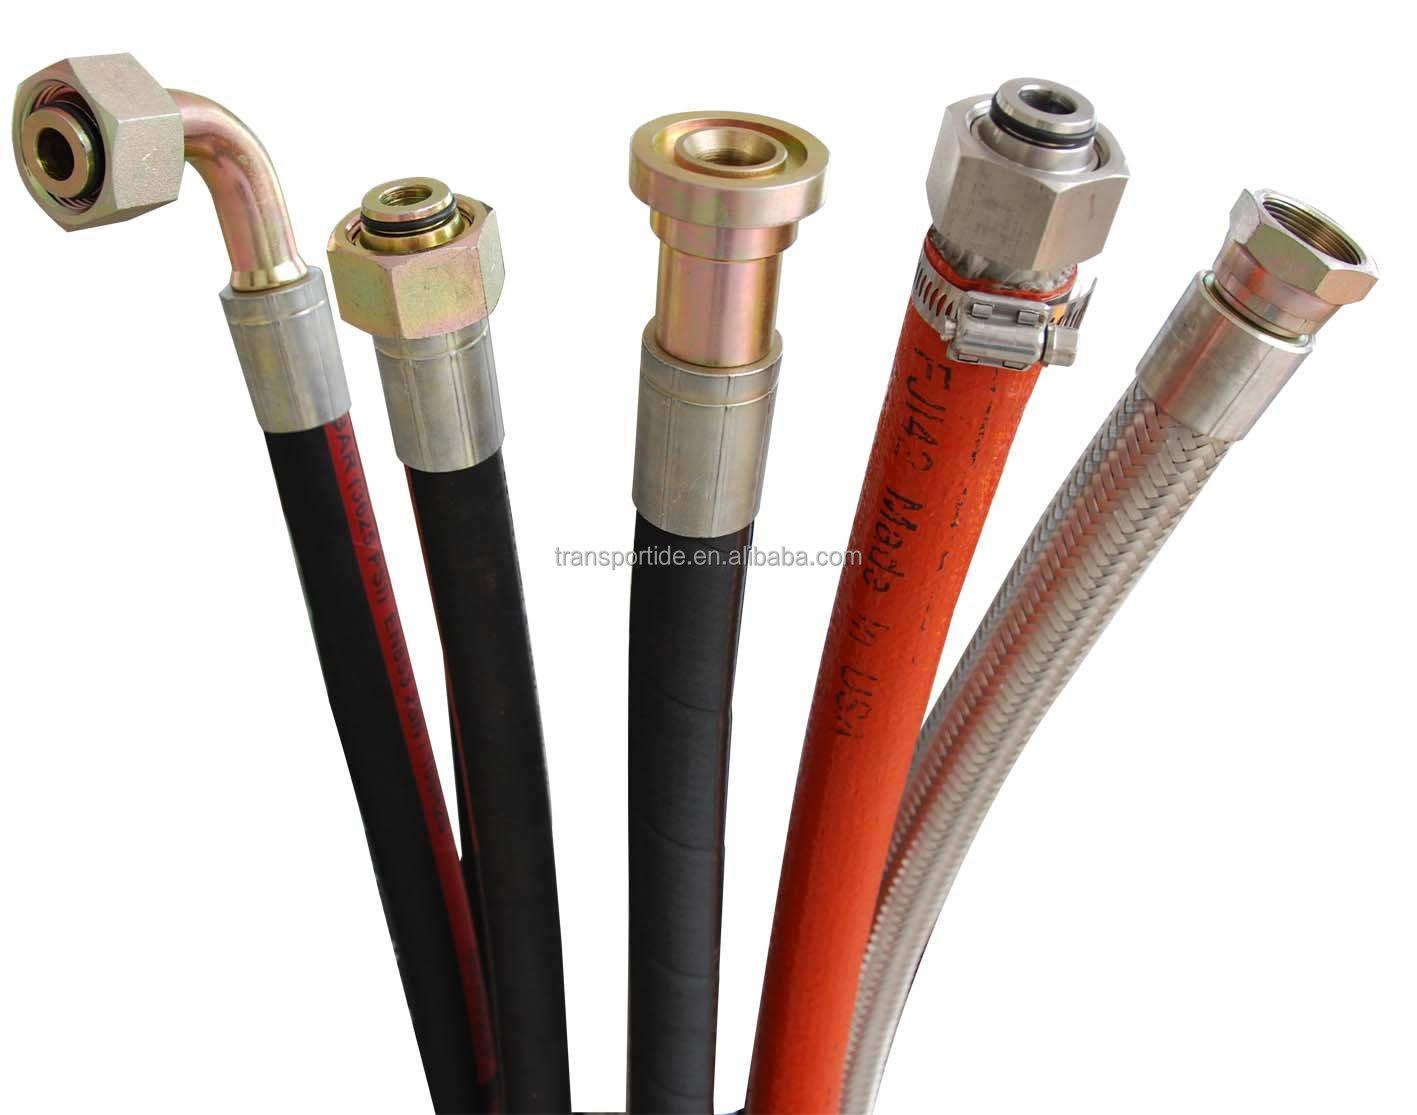 Flexible High Pressure Hydraulic Hose Pipe